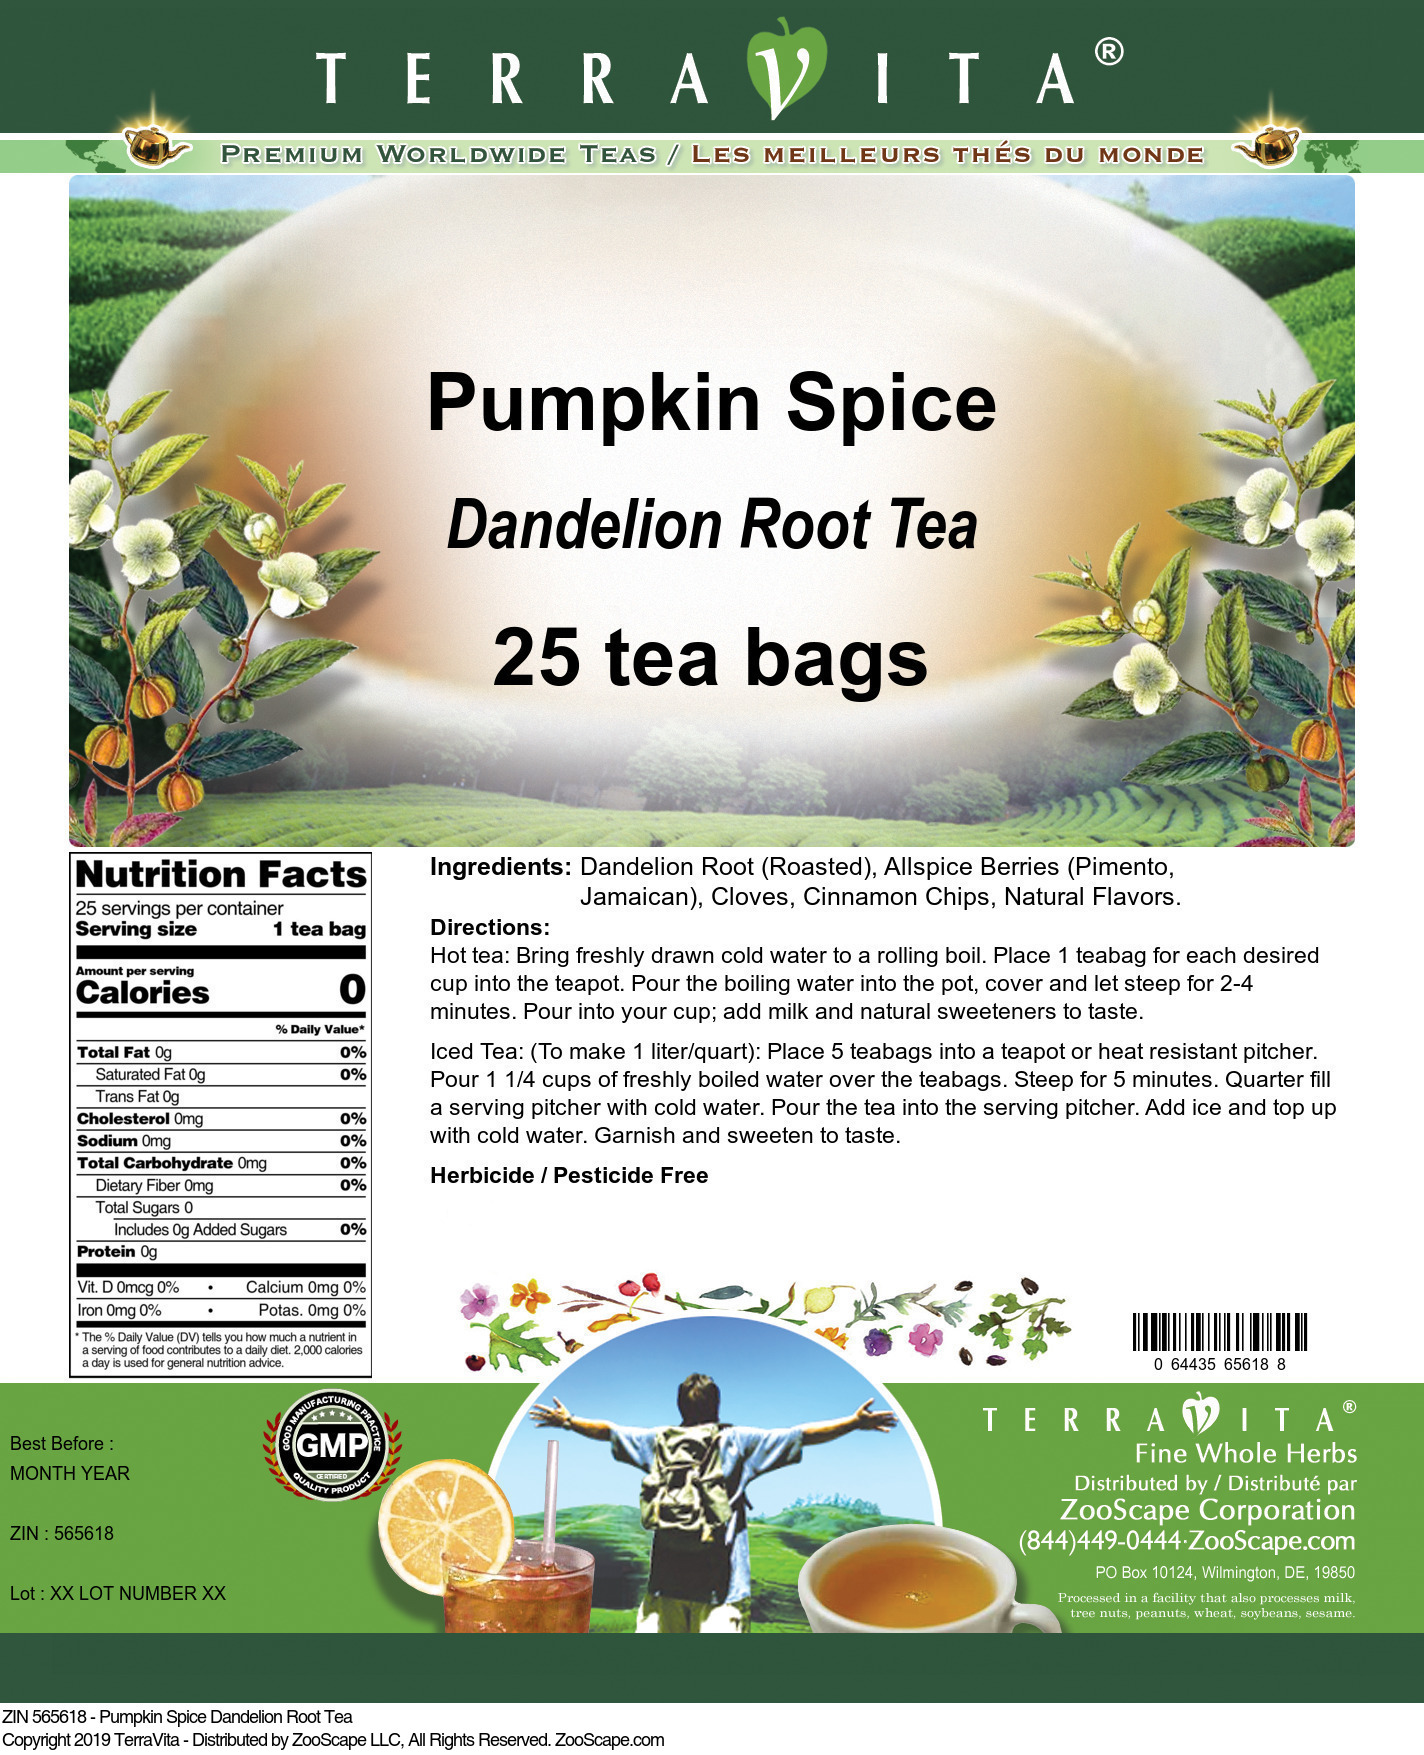 Pumpkin Spice Dandelion Root